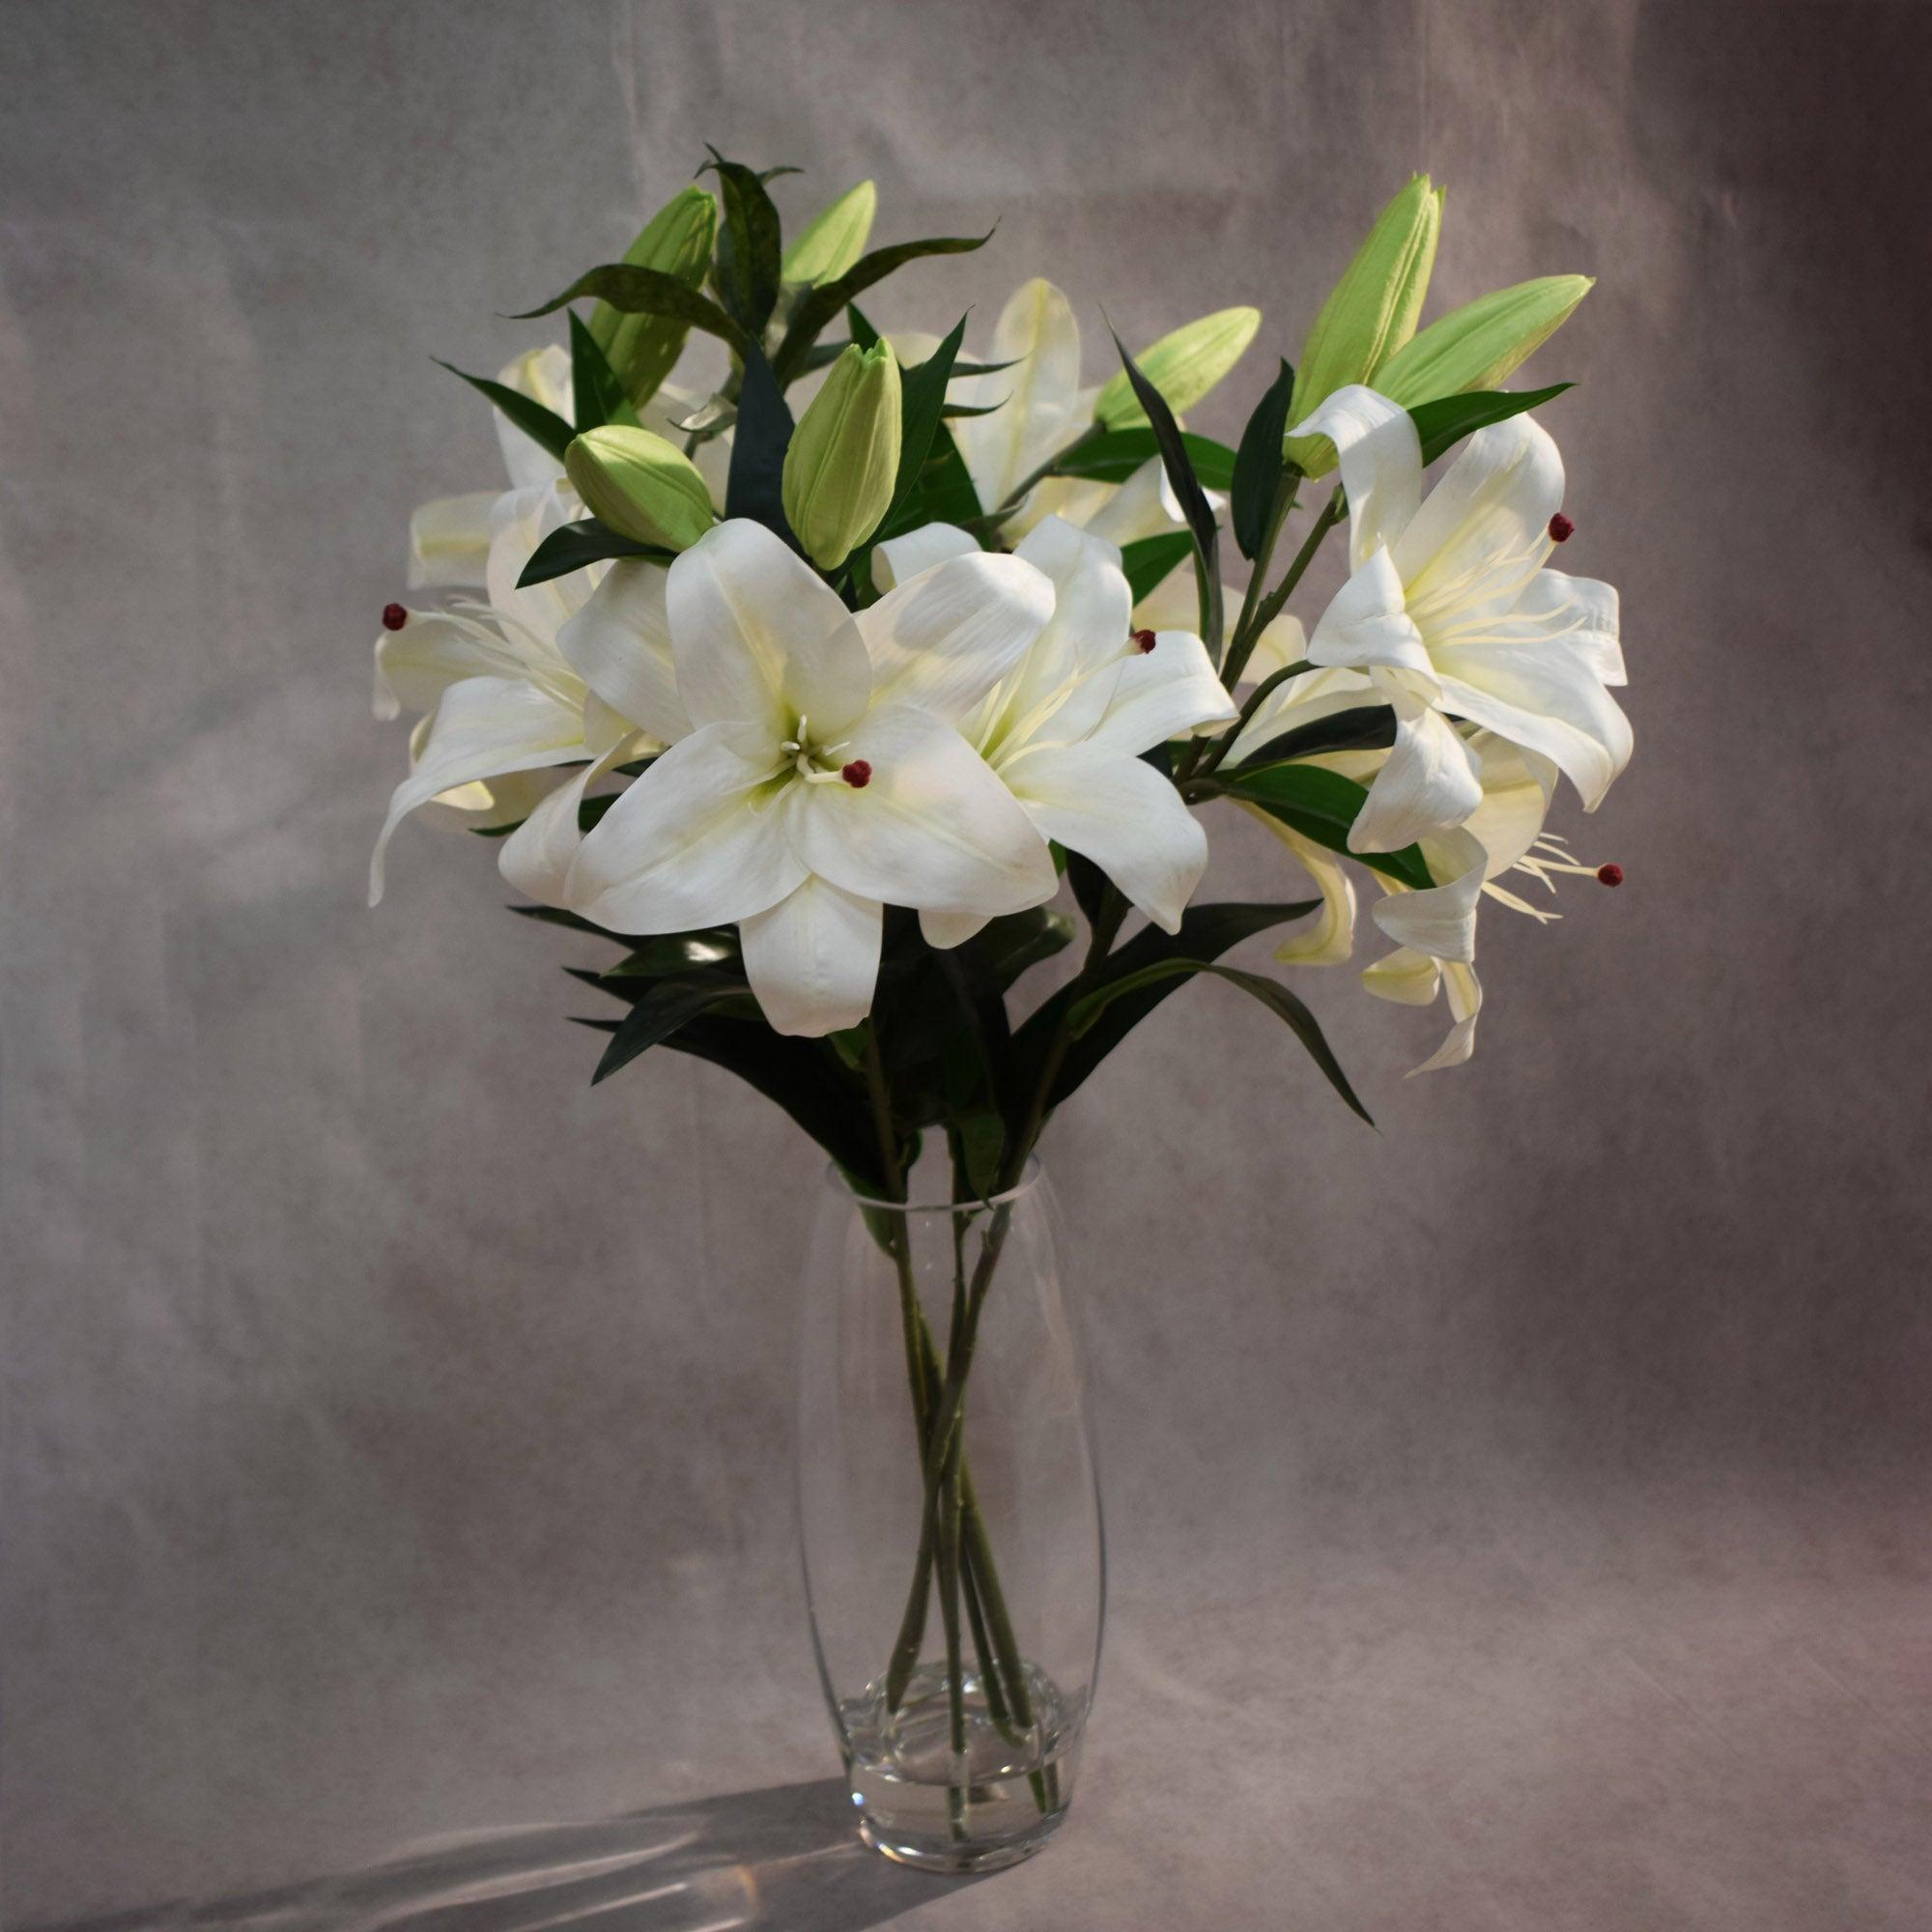 Dorma Stargazer Lilies White